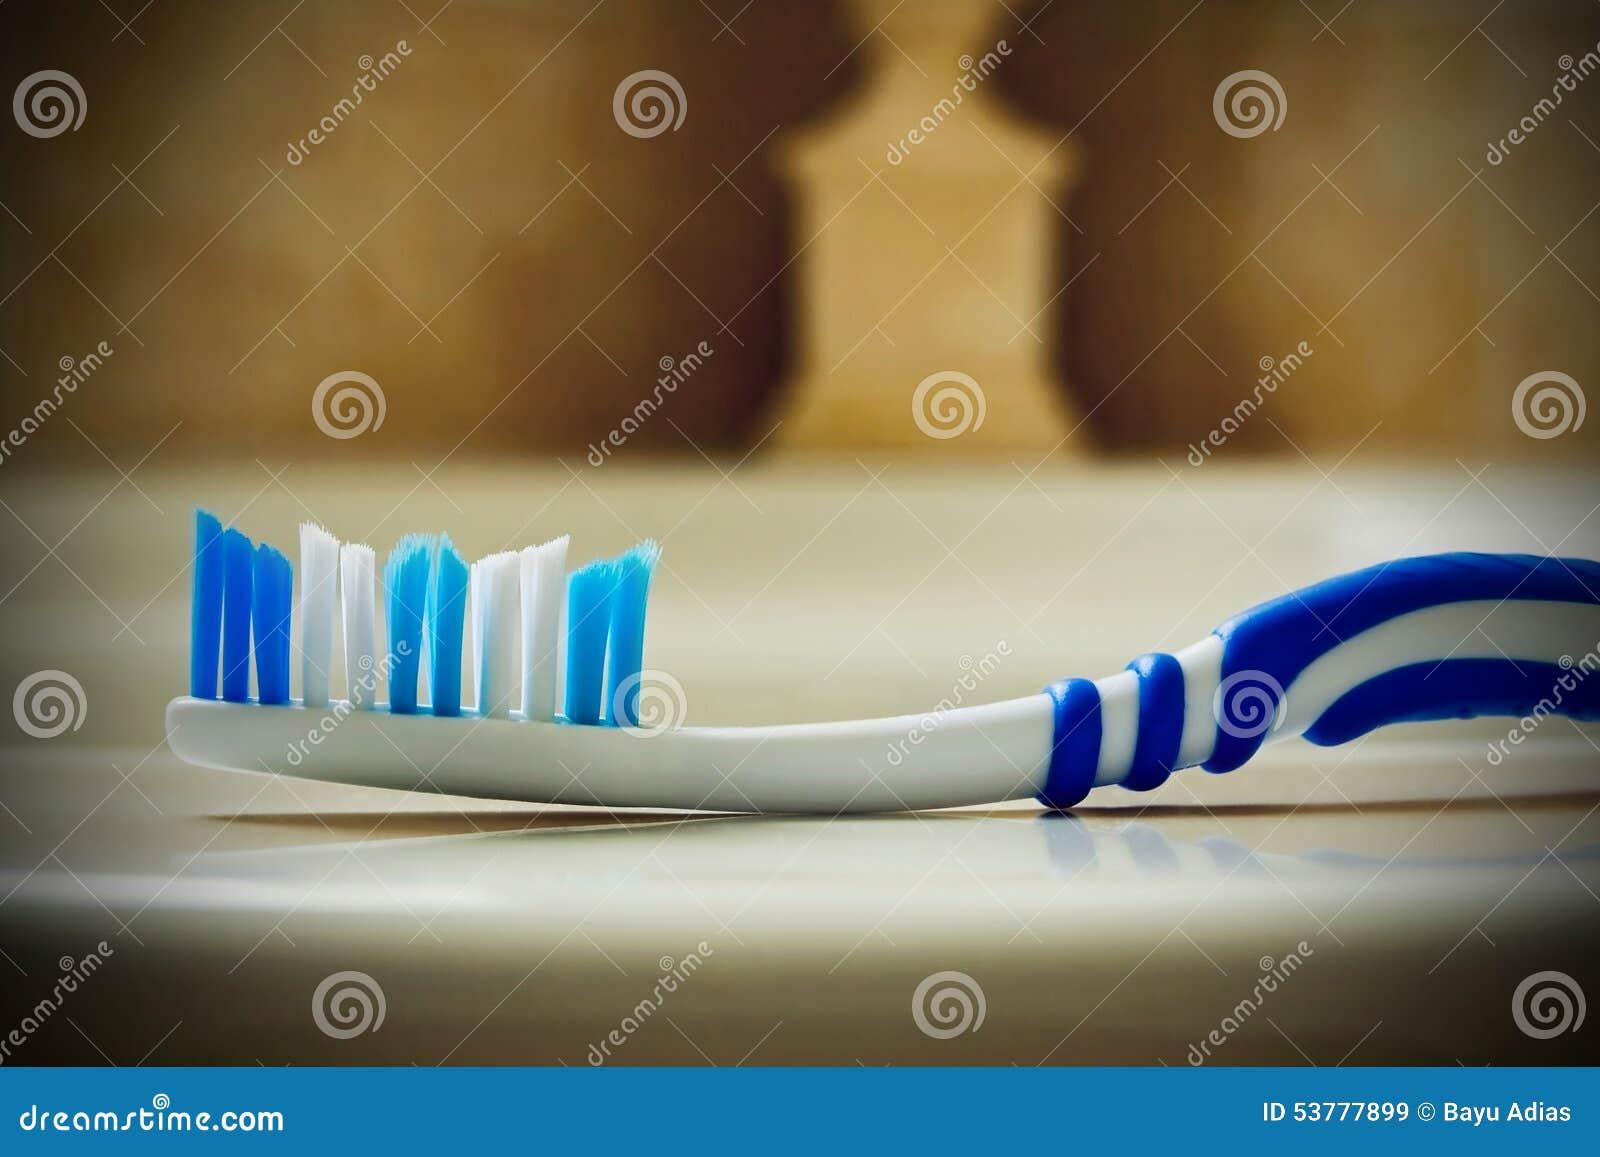 Muśnięcie - ząb